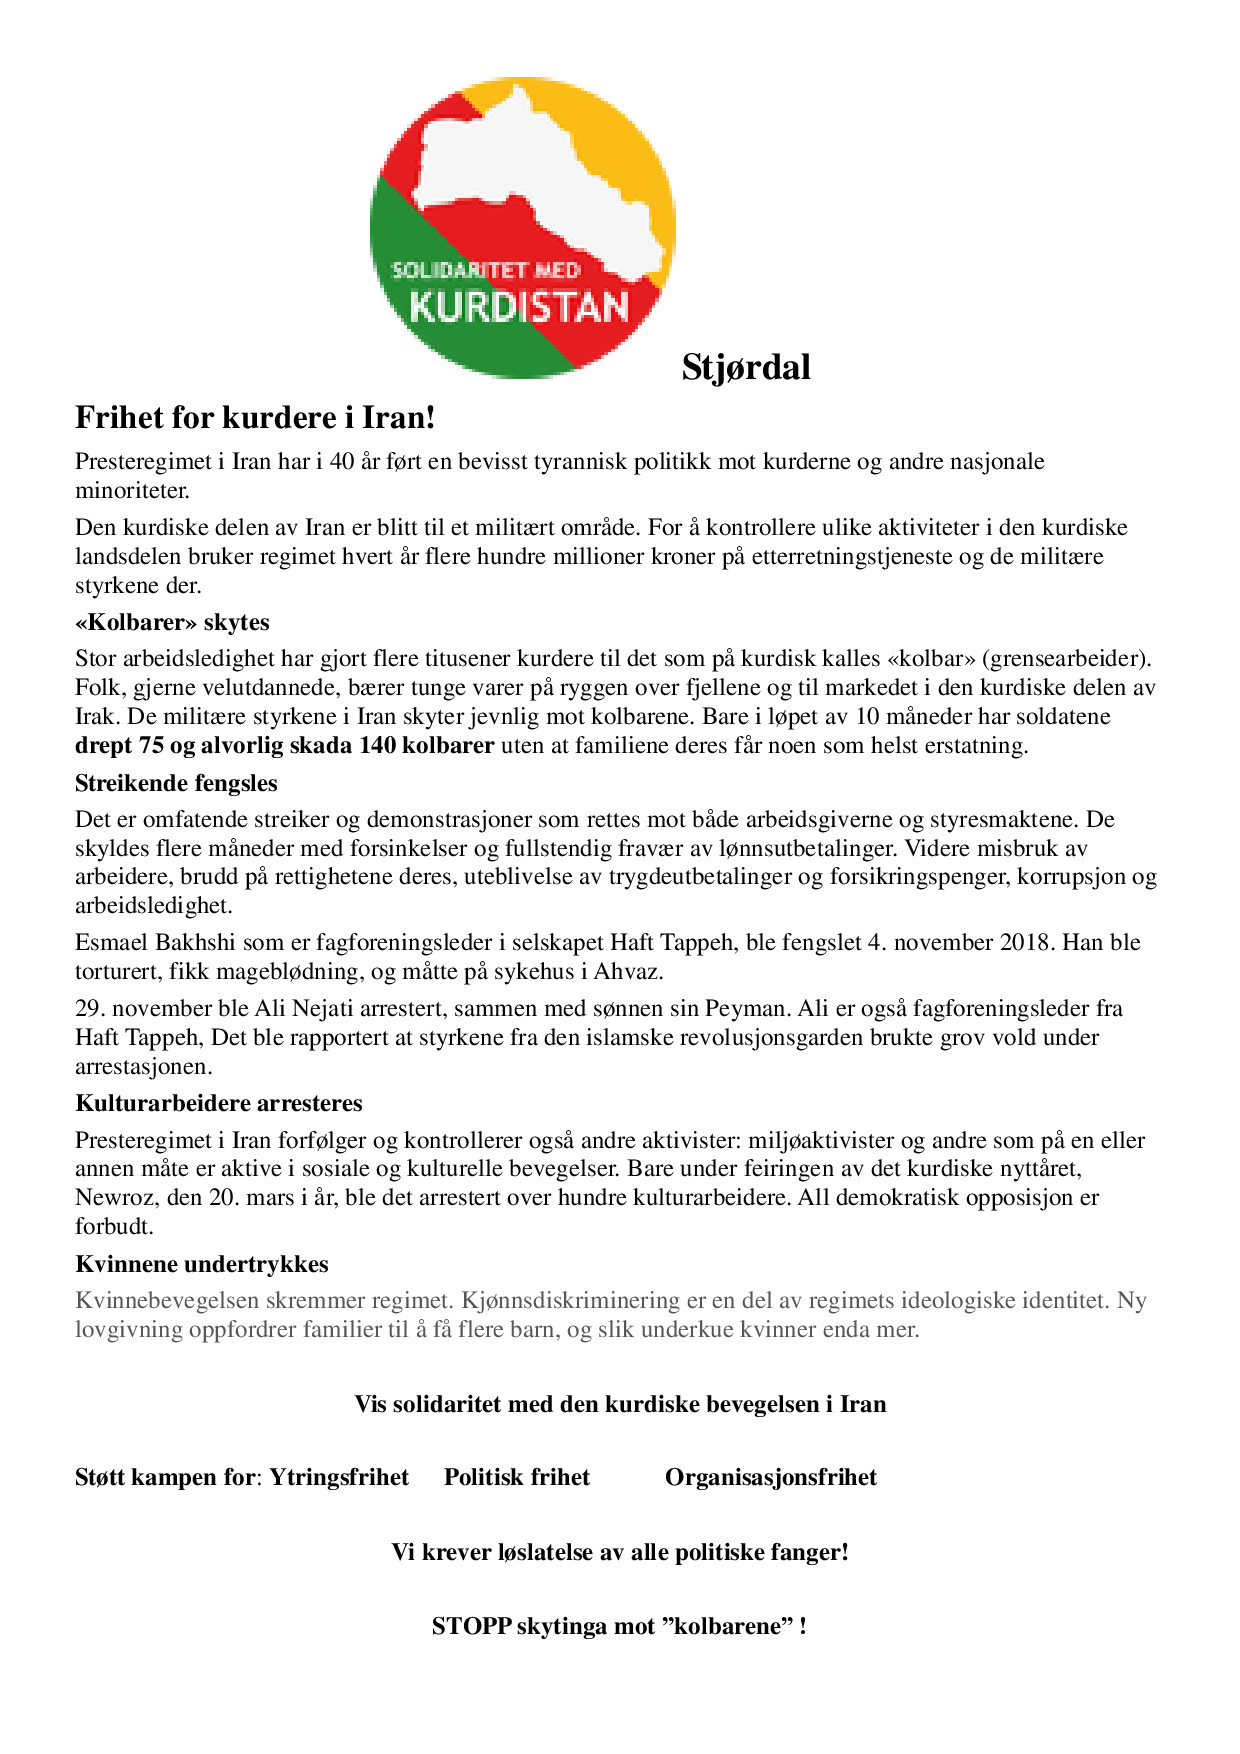 190501Frihet for kurdere i Iran (1)_p001